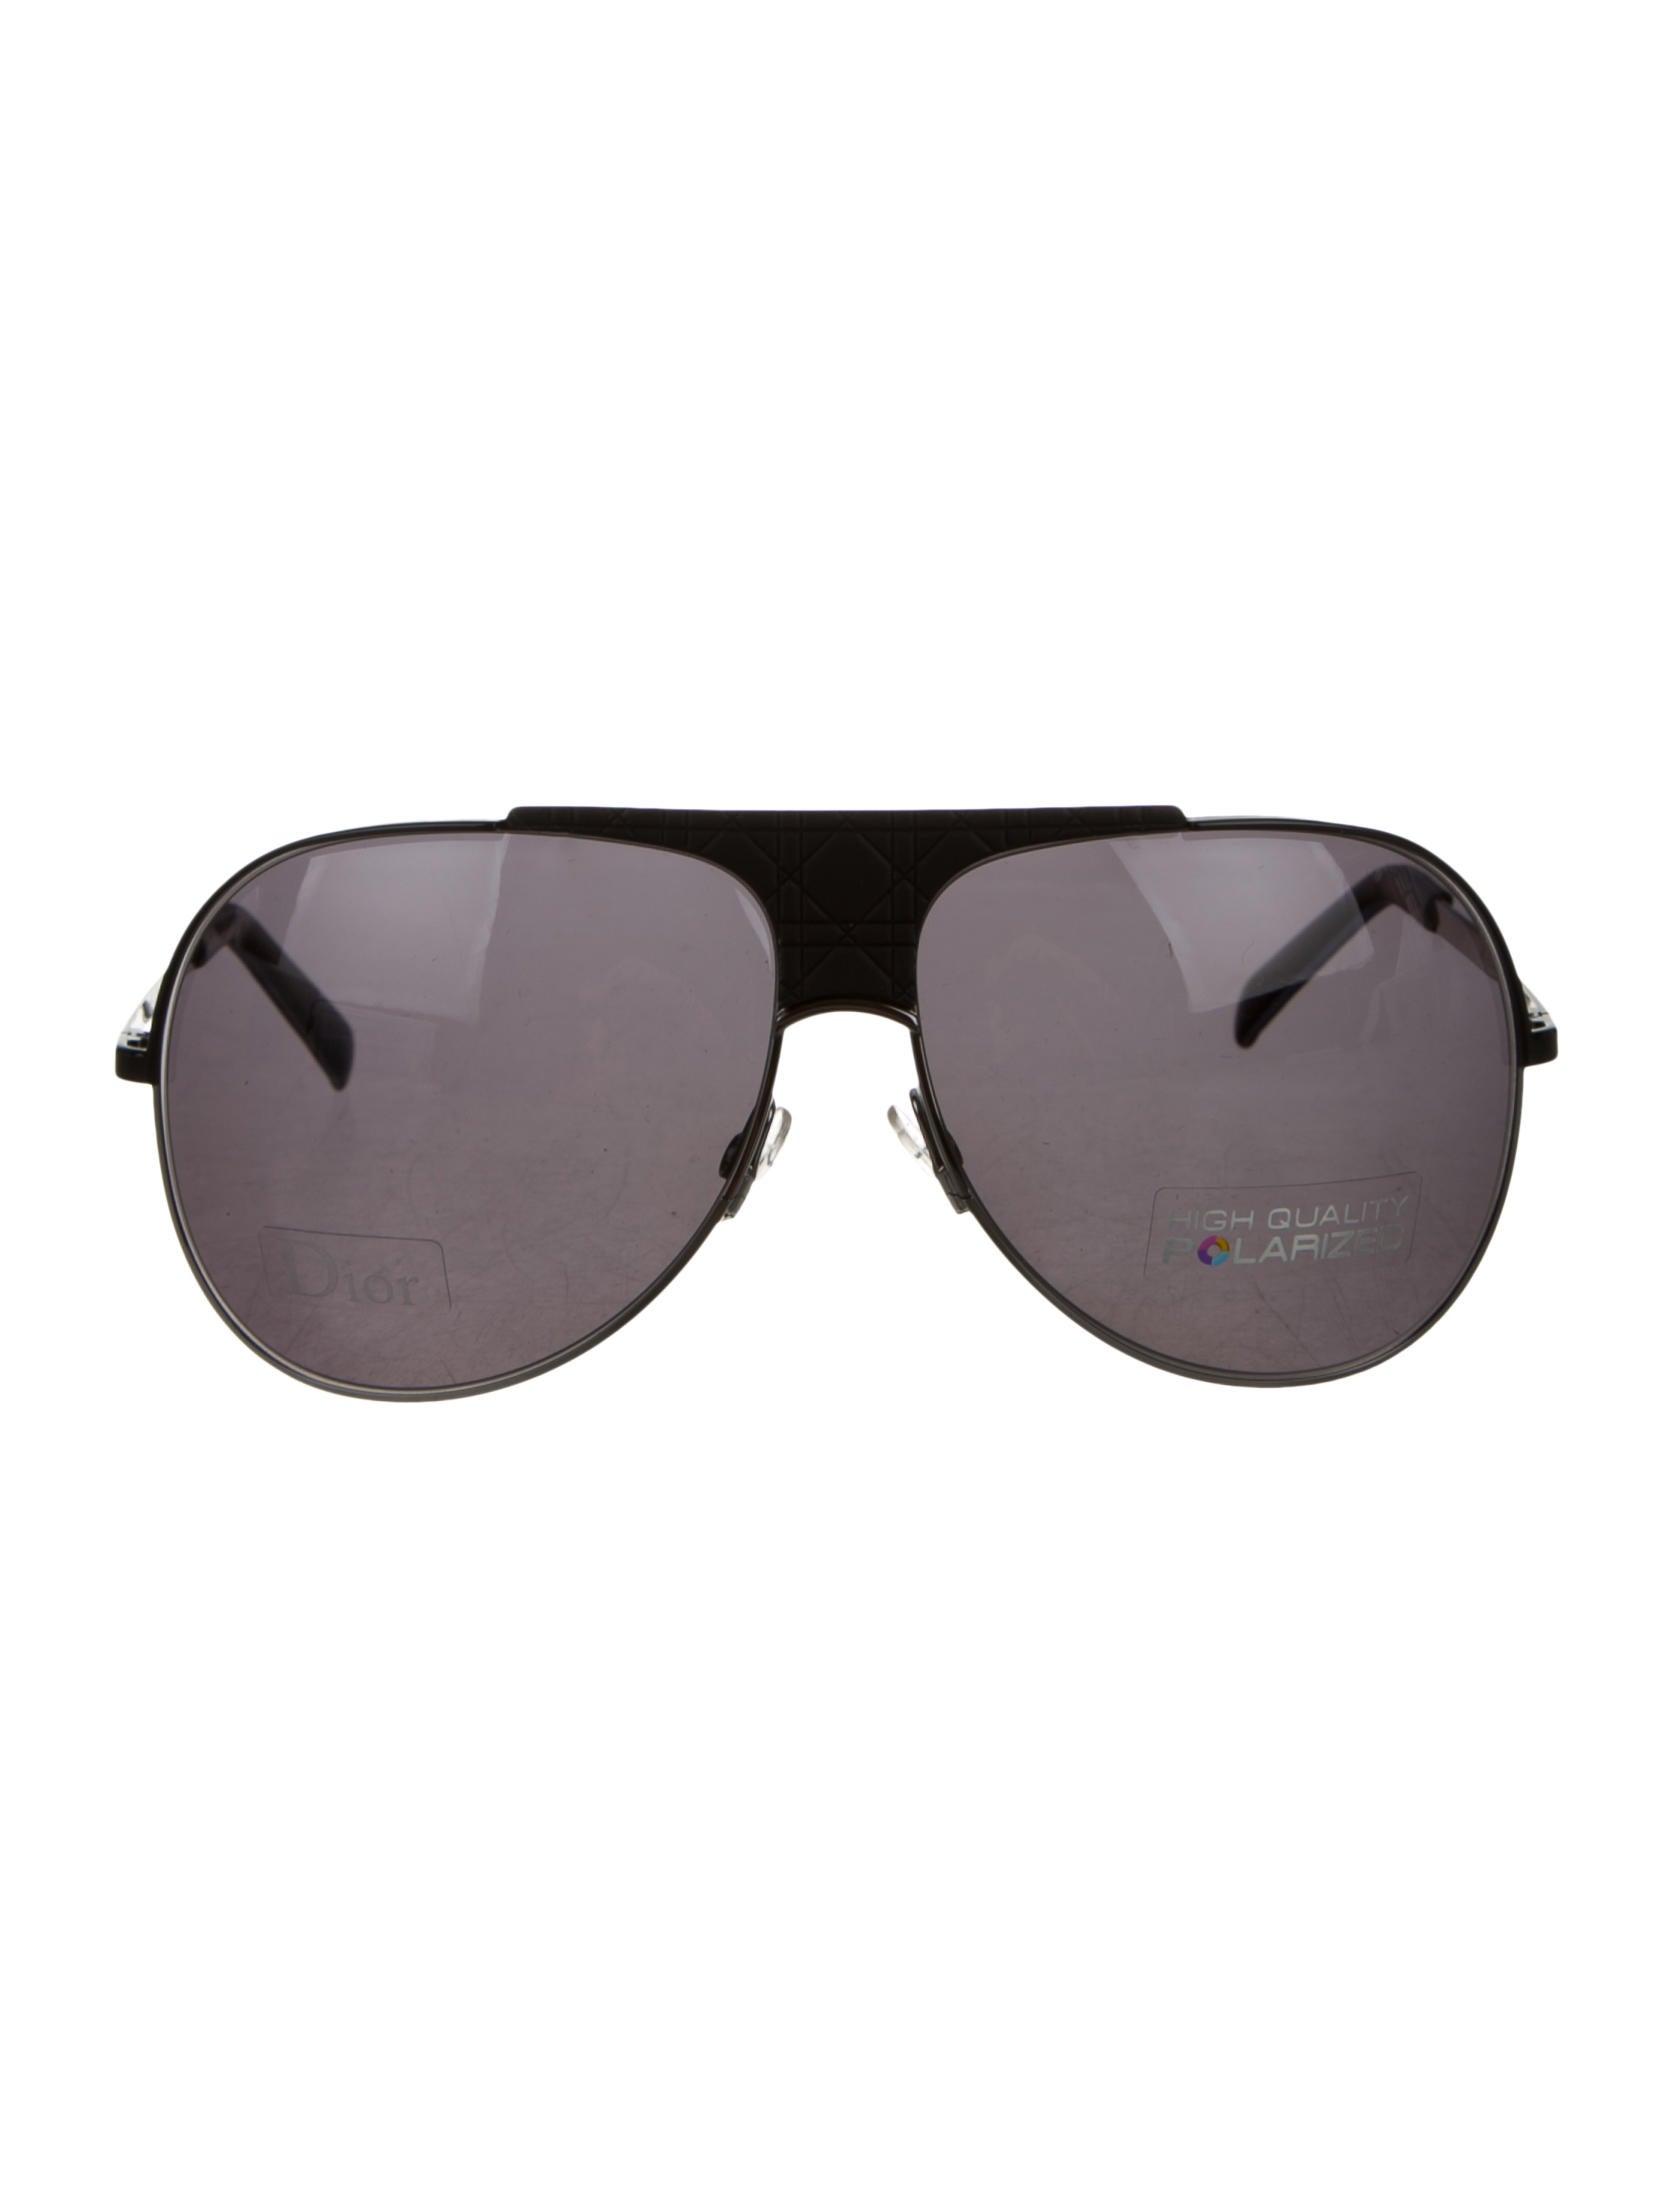 bcb8fcc5c97b Christian Dior My Lady Dior 8 Sunglasses - Accessories - CHR43727 ...